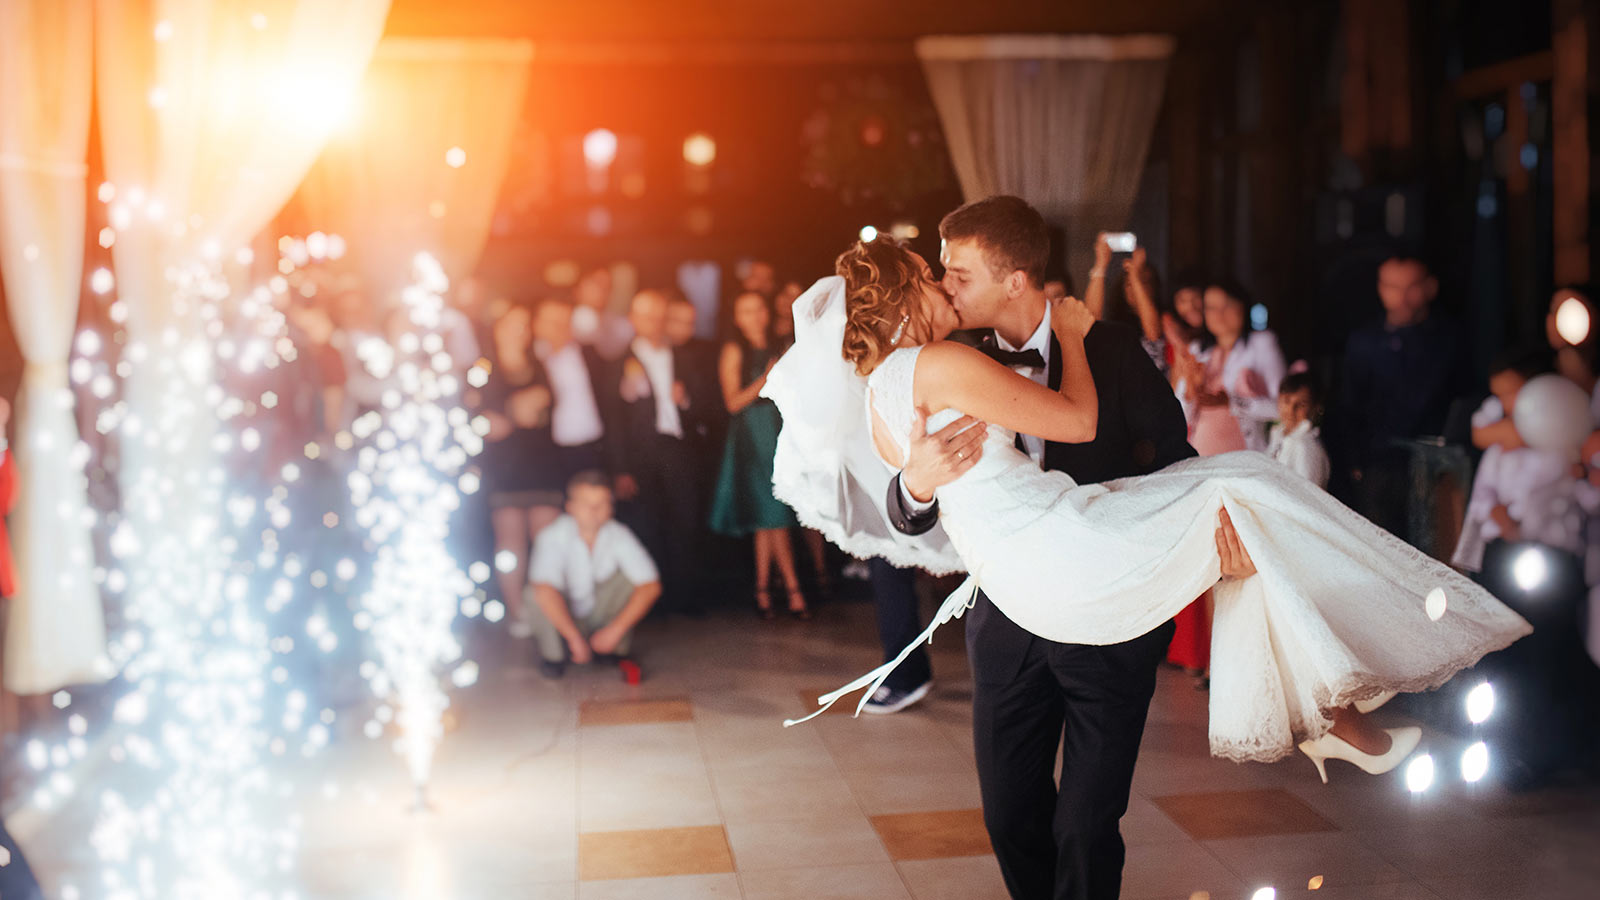 Hochzeit Finanzieren Bargeld Fur Nisan Gecesi Dugun Geschenk